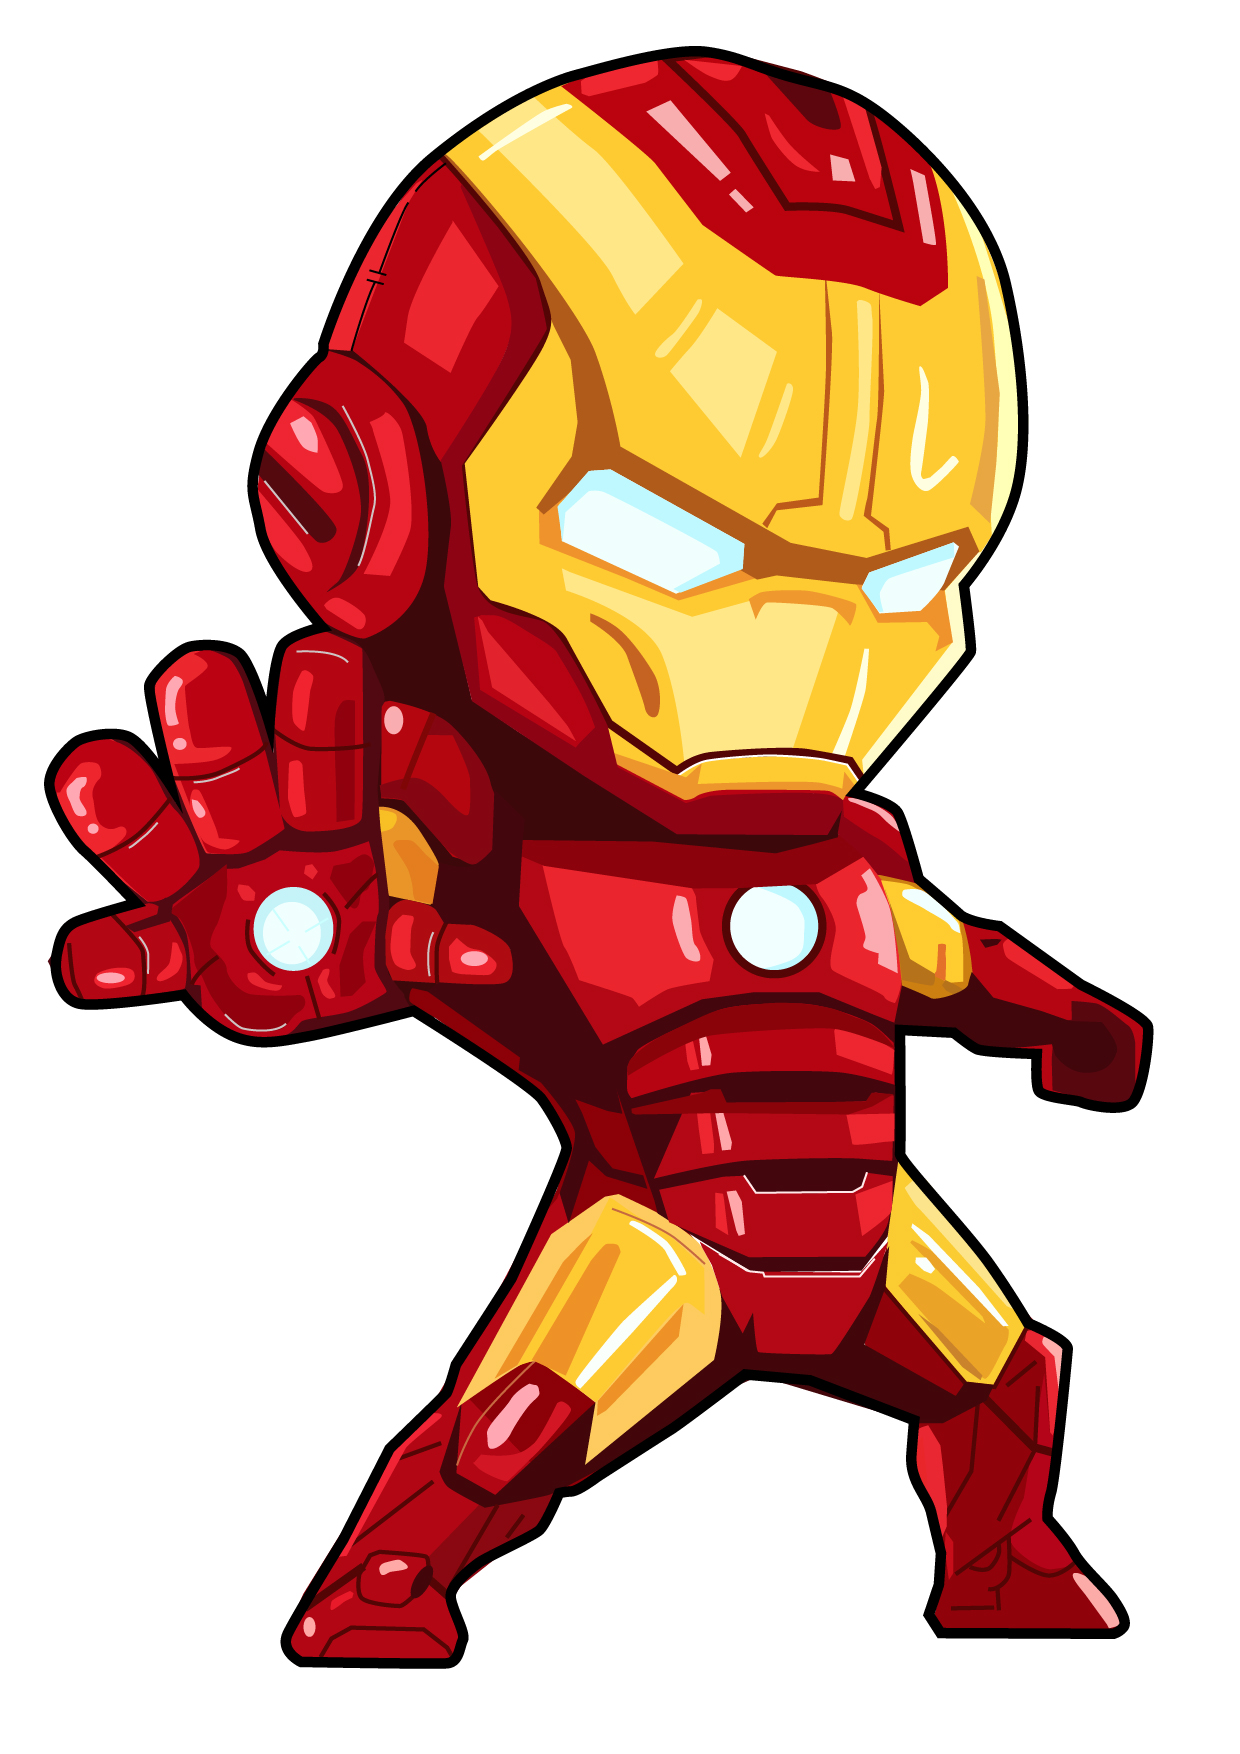 ironman卡通头像